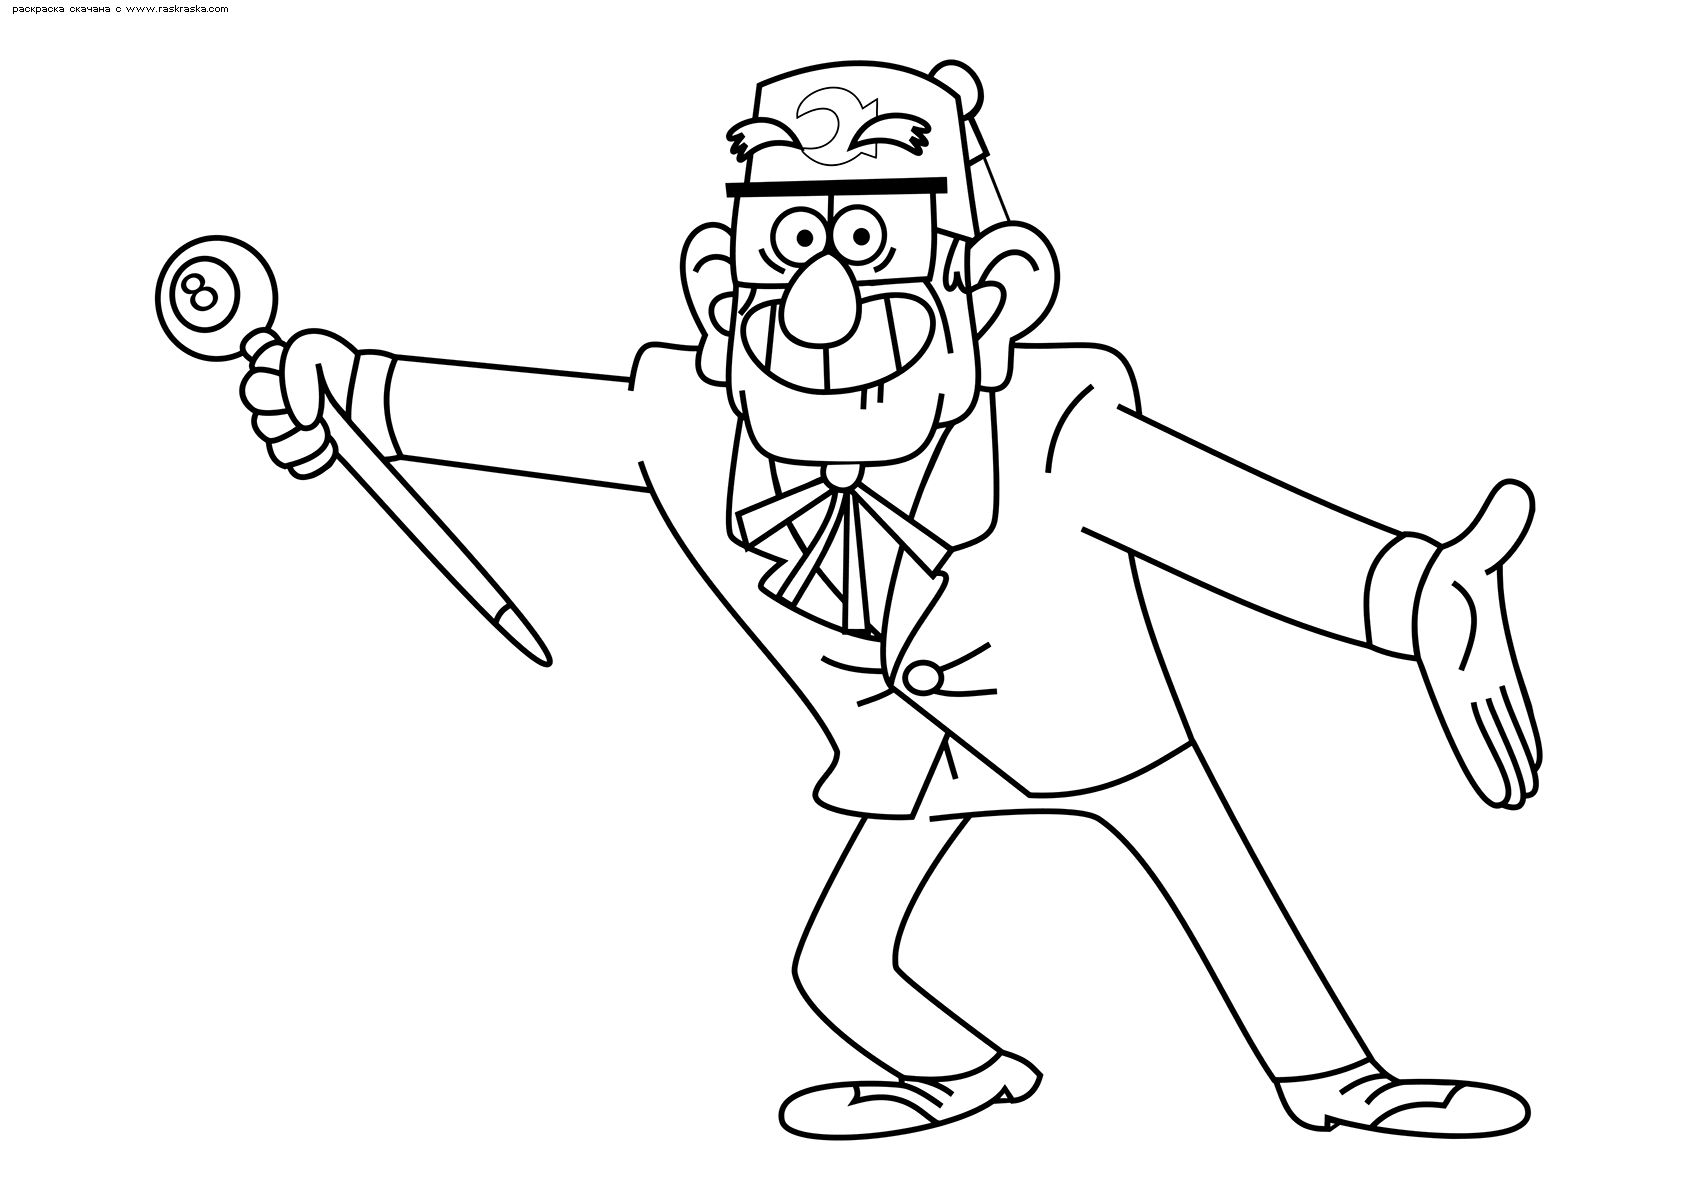 Раскраска Дядя Стэн. Раскраска Дедушка из Гравити Фолз